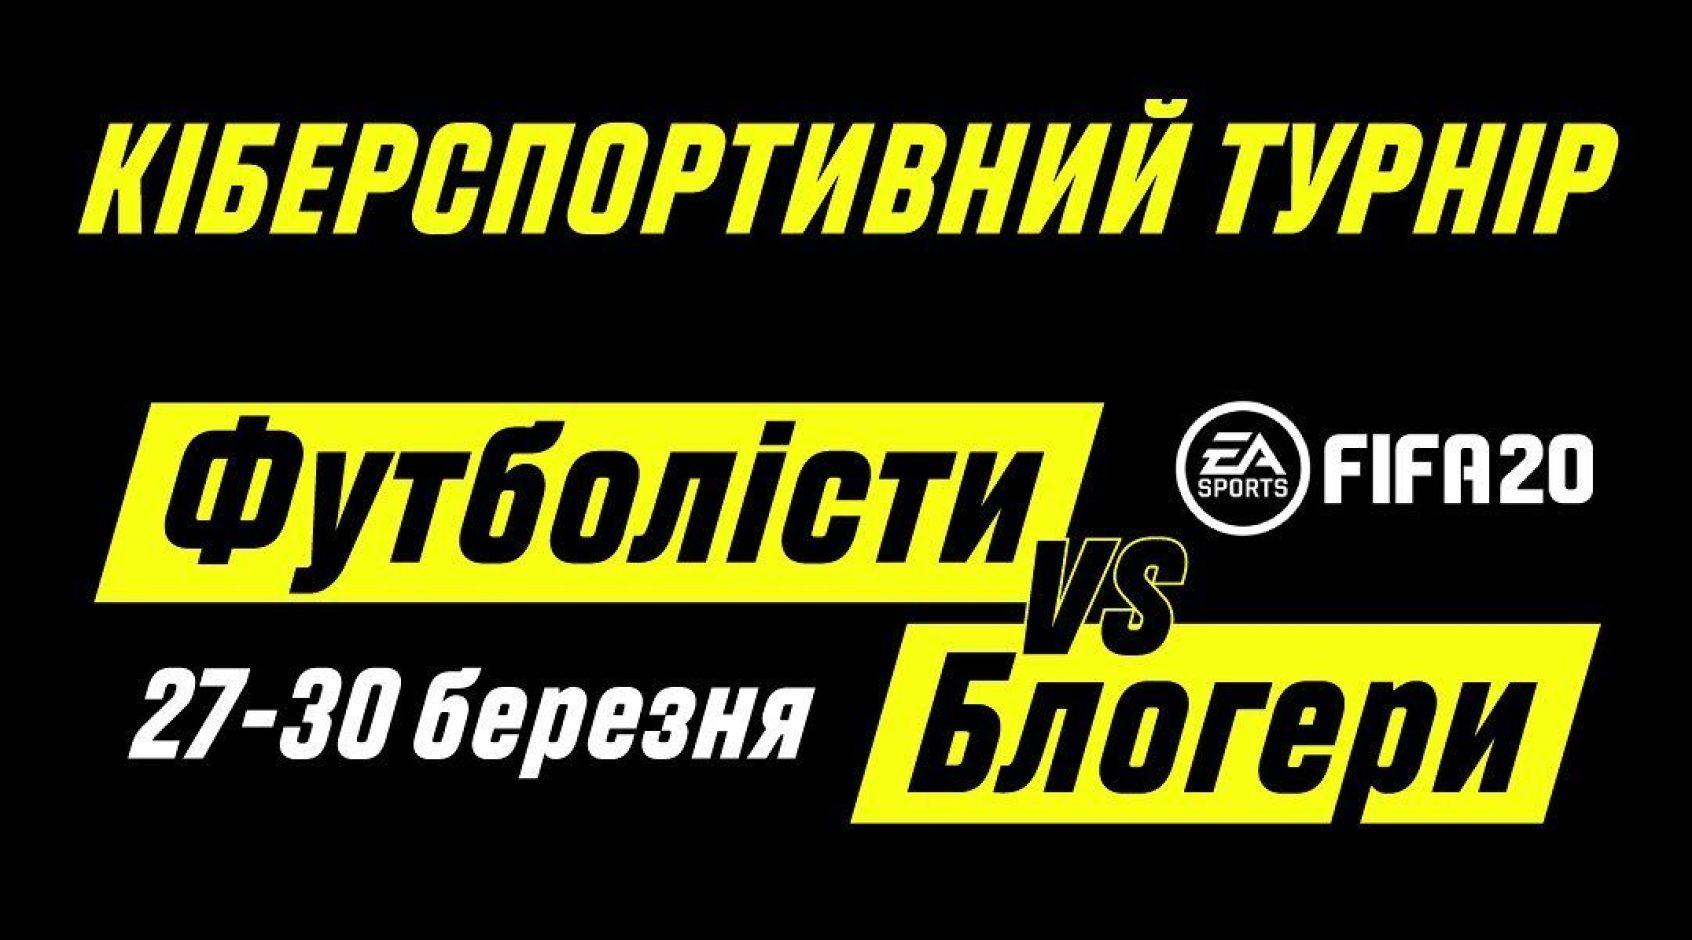 "Киберфутбол. FIFA 20. ""Футболісти vs Блогери"". Лобода vs Астаф'єва: прогноз на матч"